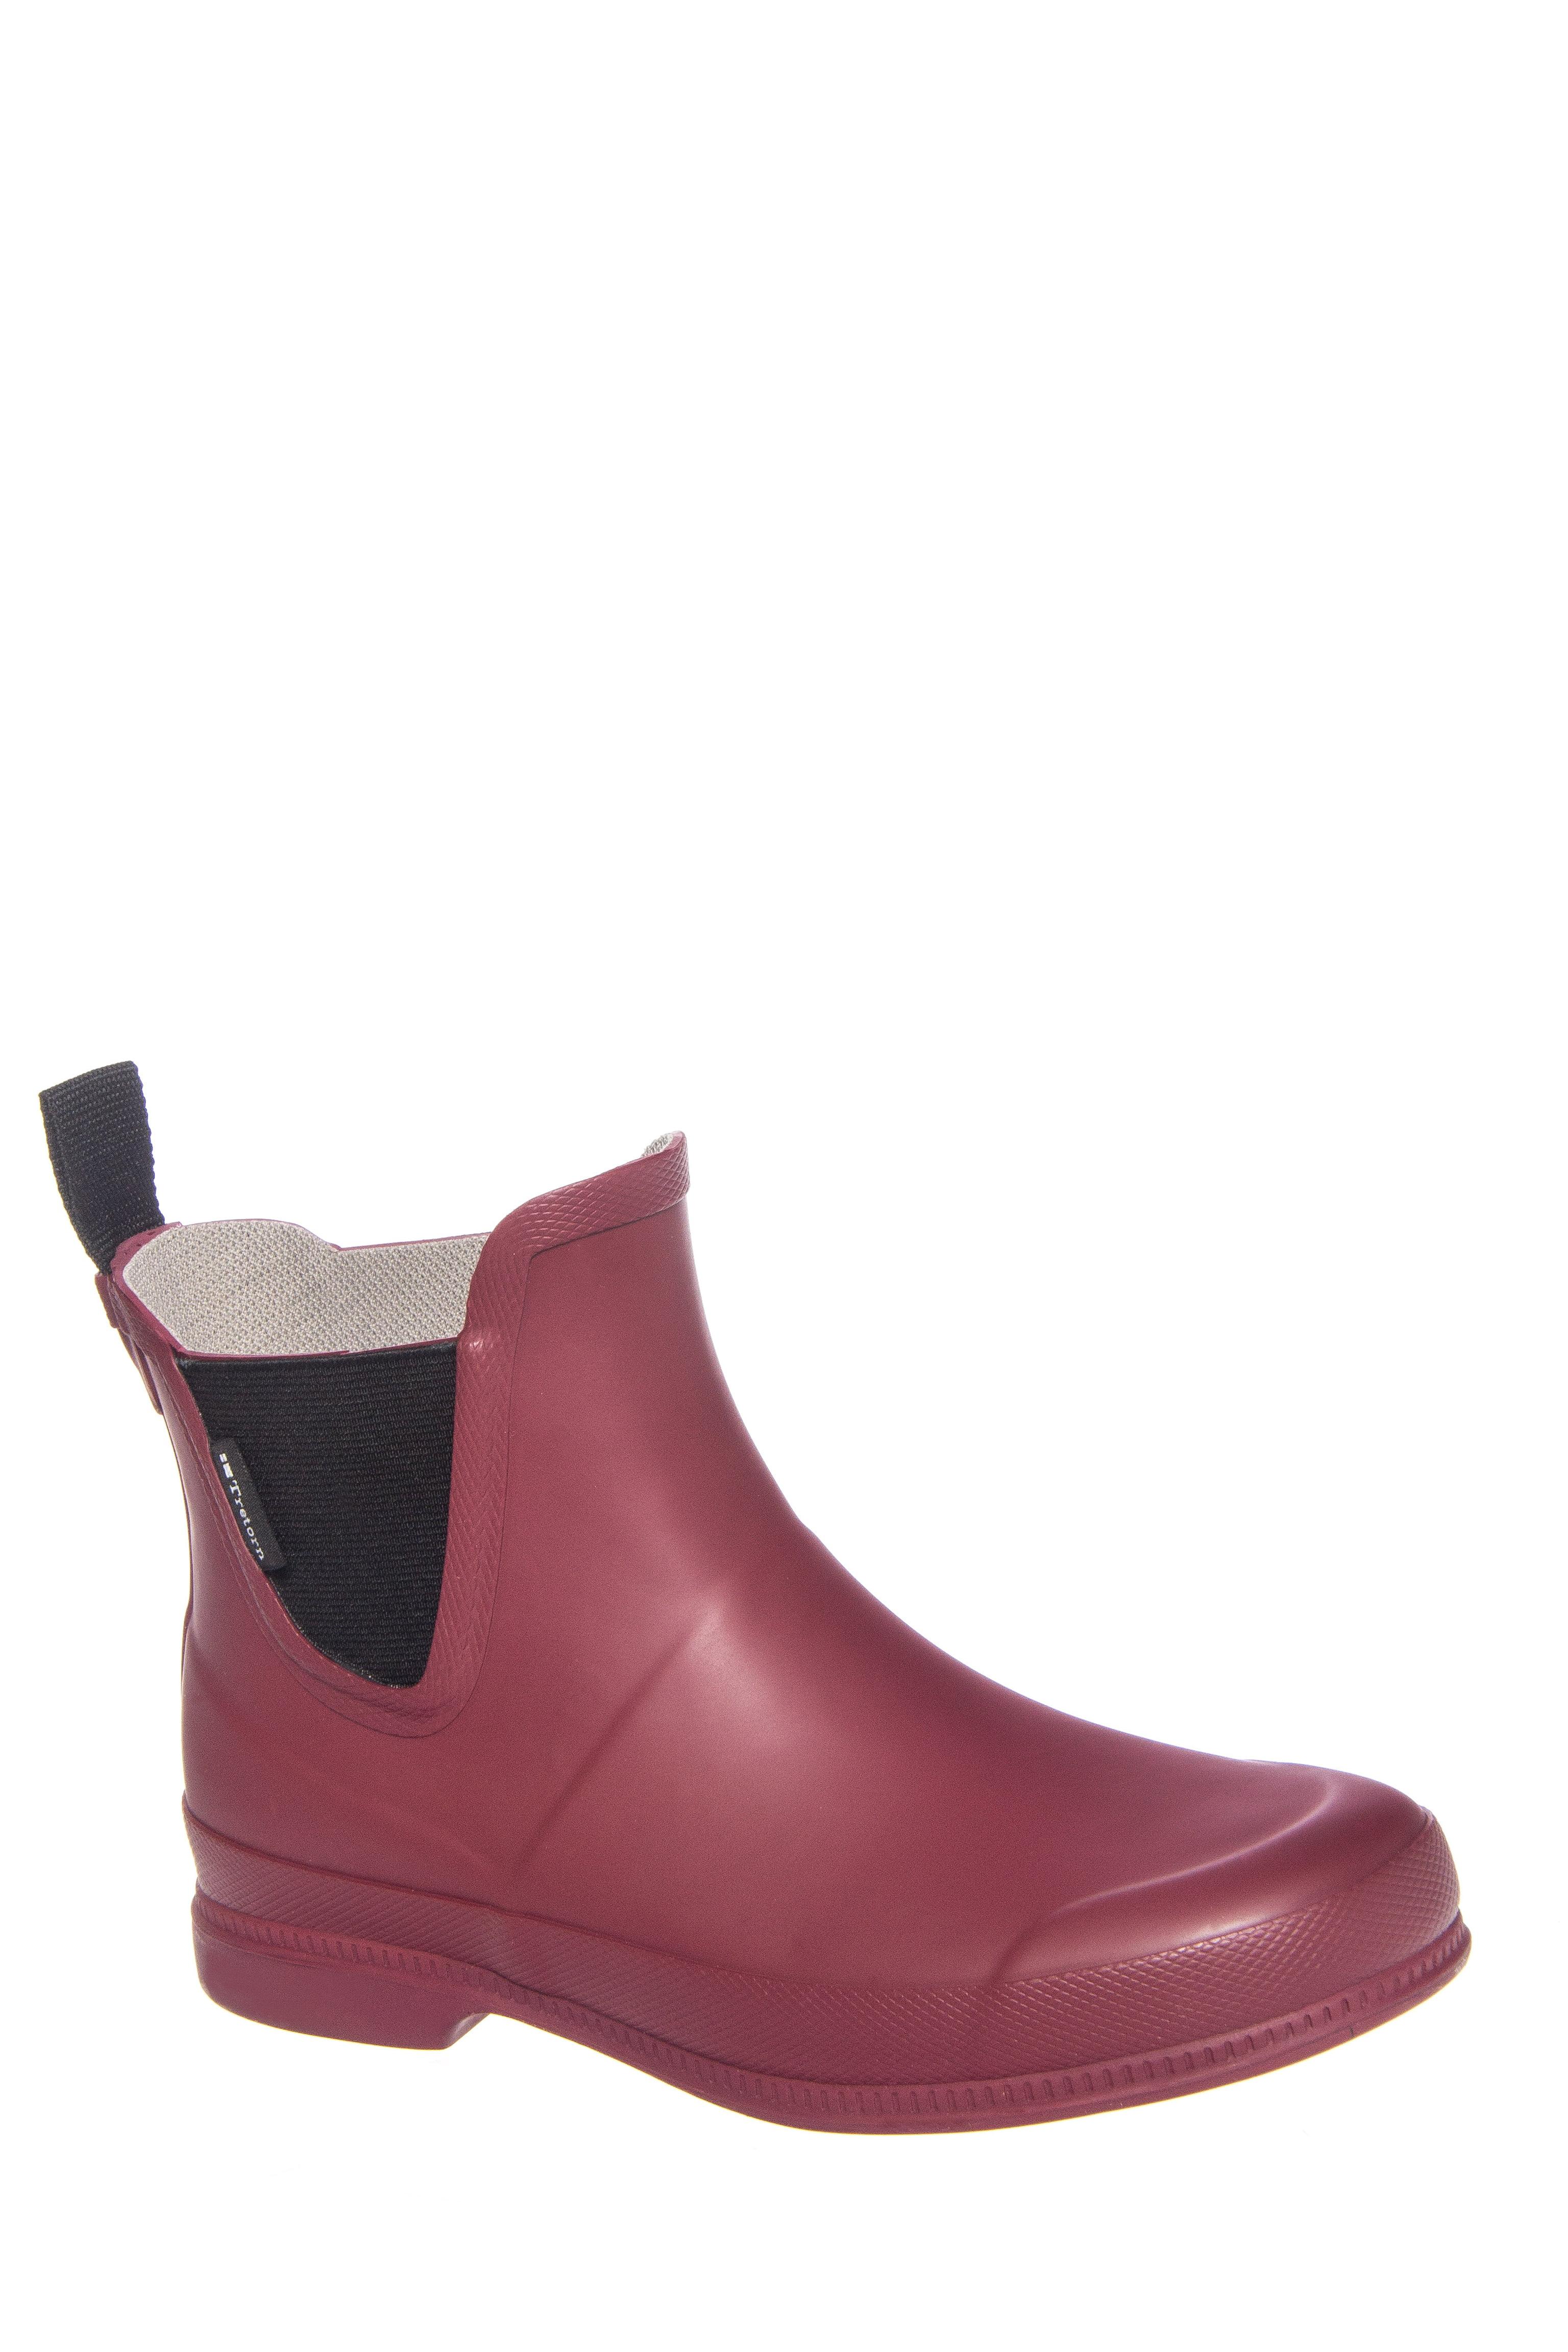 Click here to buy Tretorn Eva Classic Low Heel Rain Boot Burgundy by Tretorn.